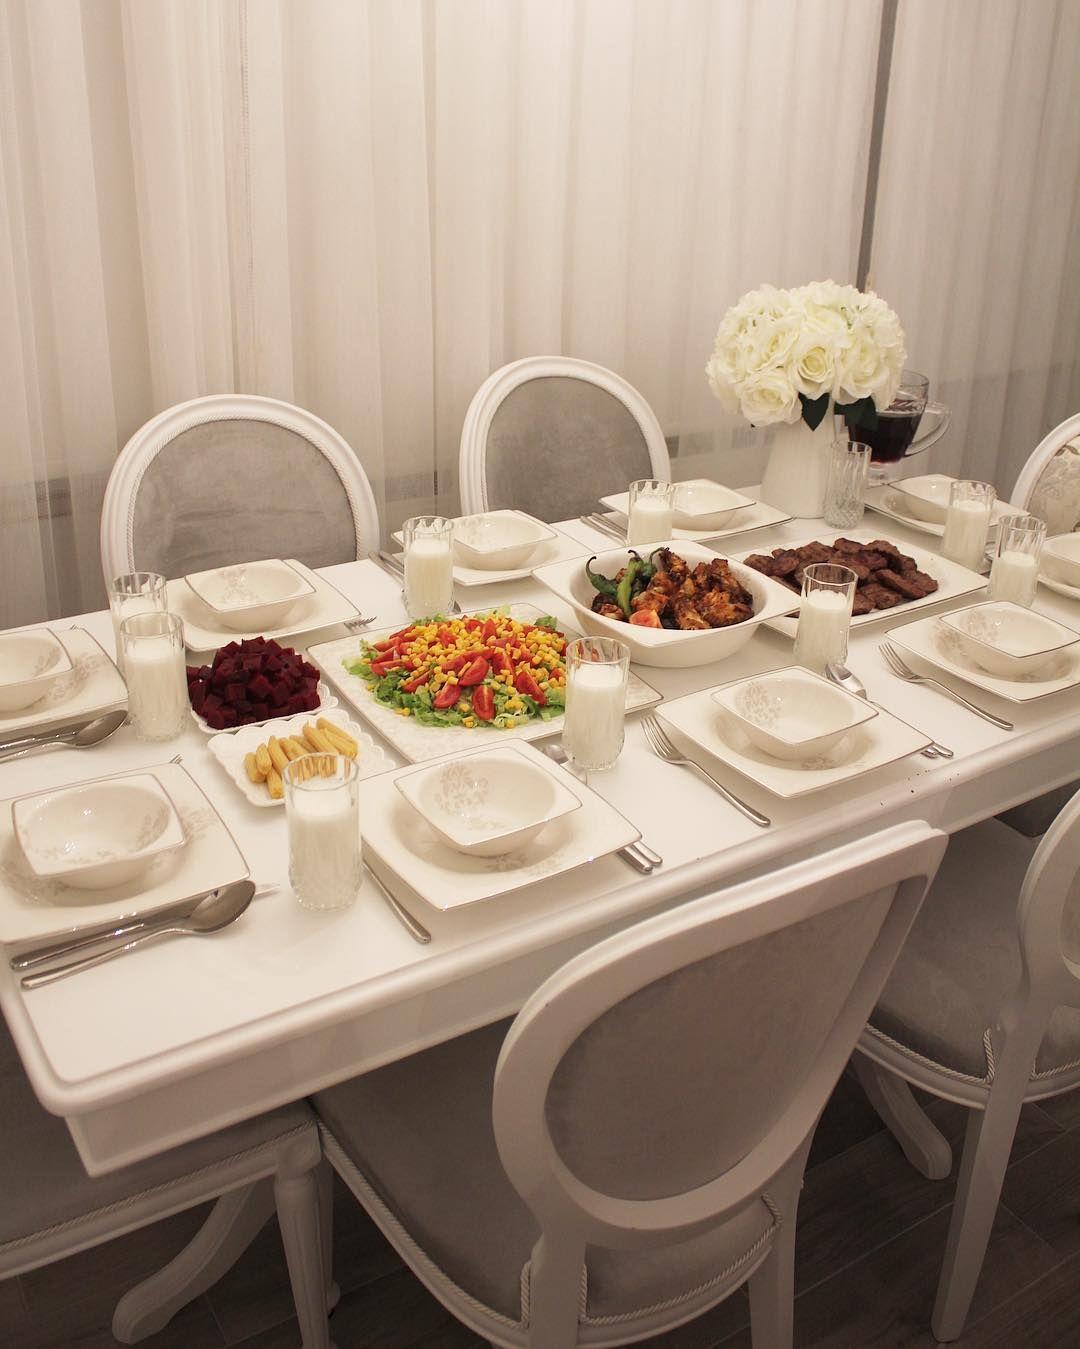 Dinner Table Kitchen Decor Dinnerideas Dinnerisserved